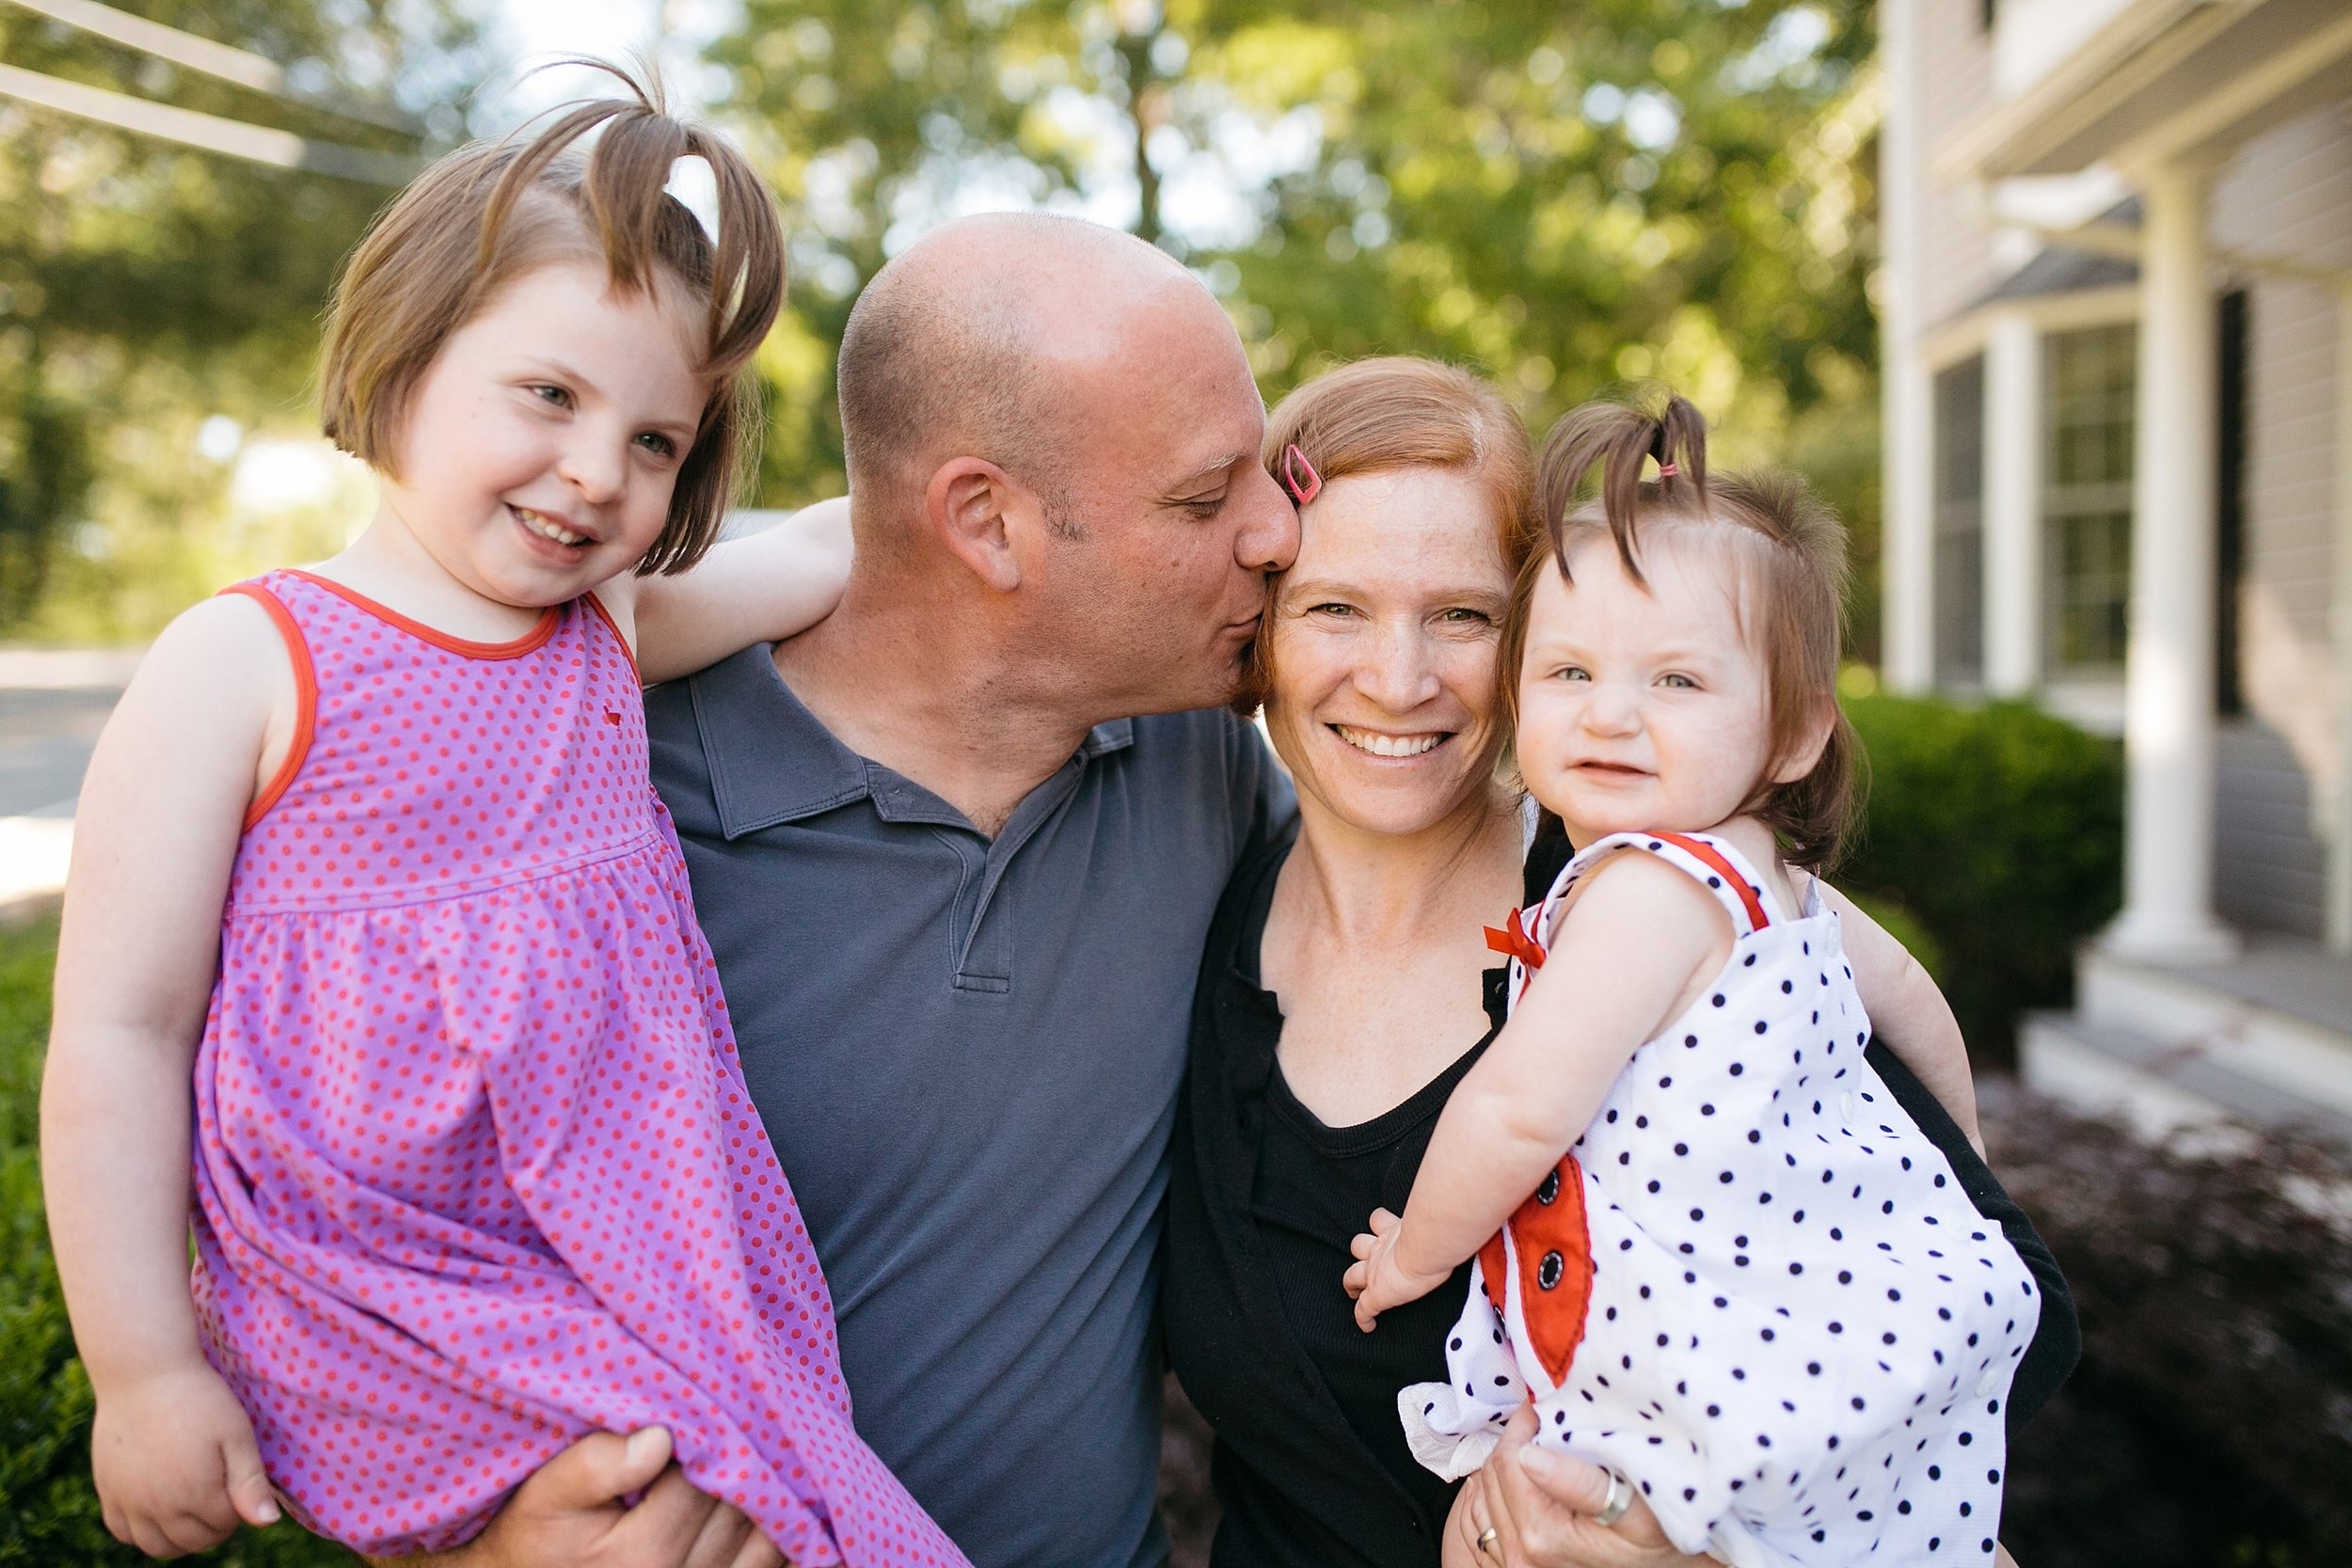 003 family event wedding photography los angeles.jpg